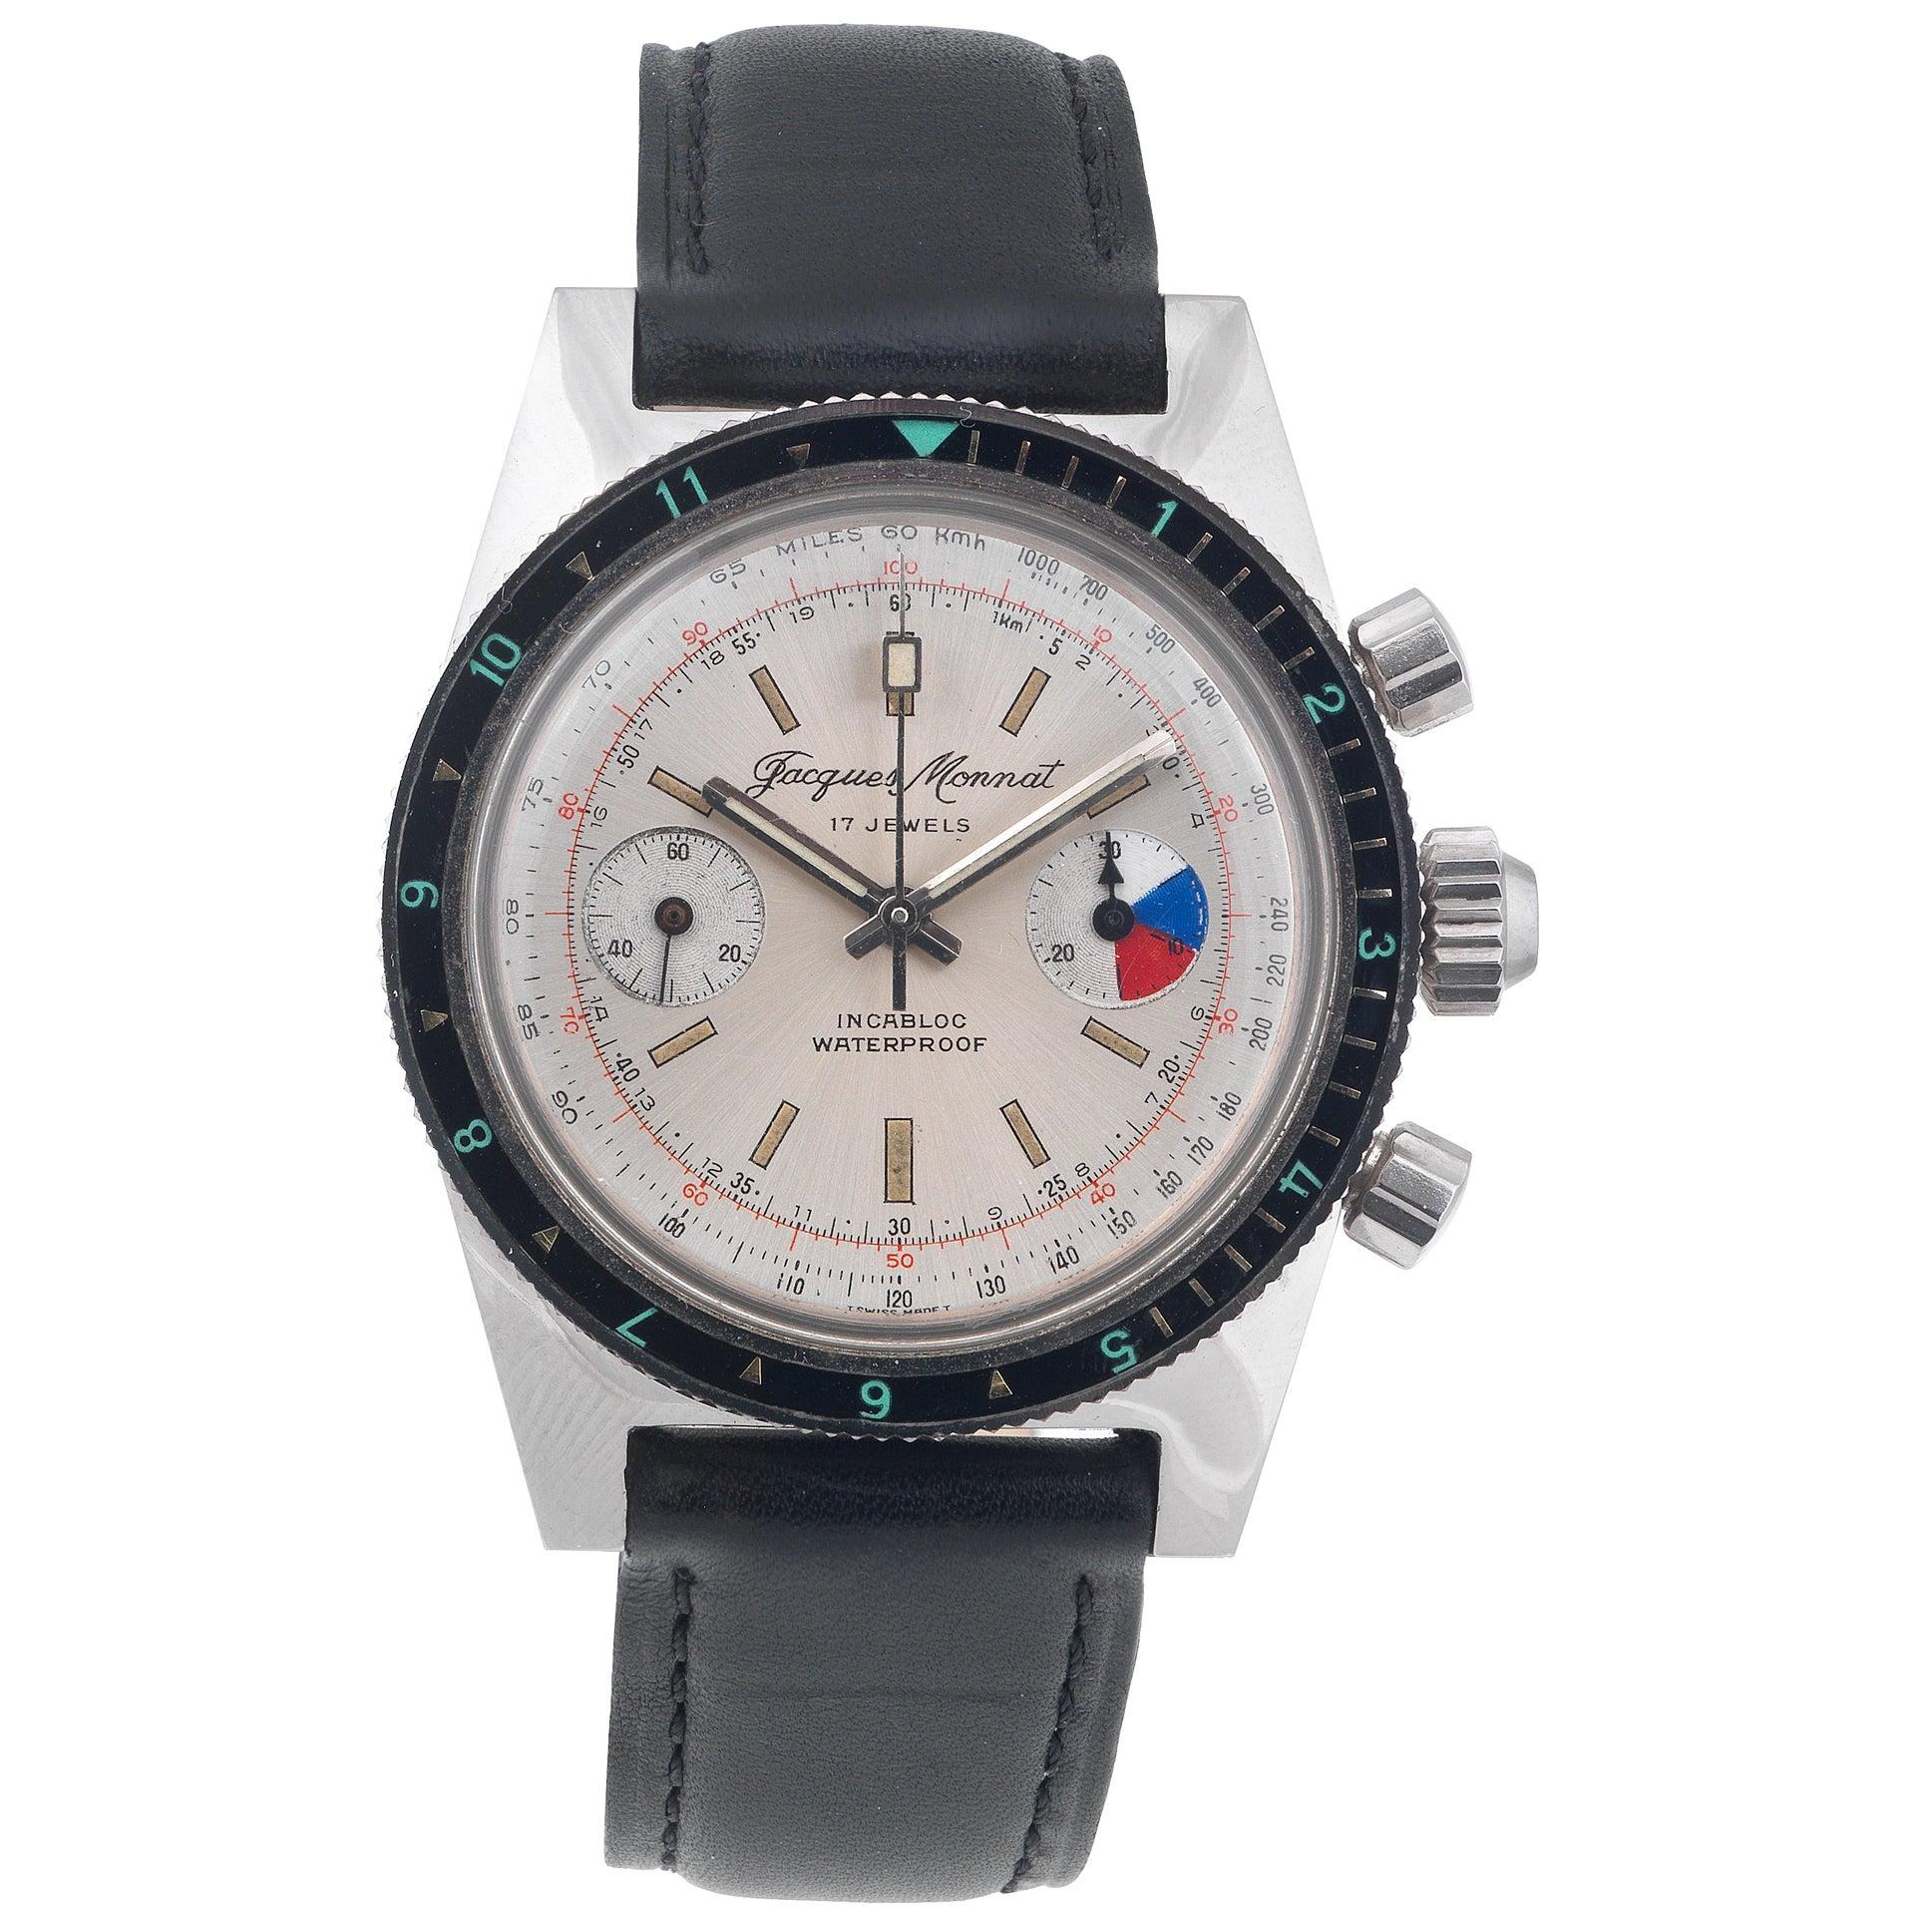 Jacques Monnat Stainless Steel Diver's Chronograph manual Wristwatch, 1970s